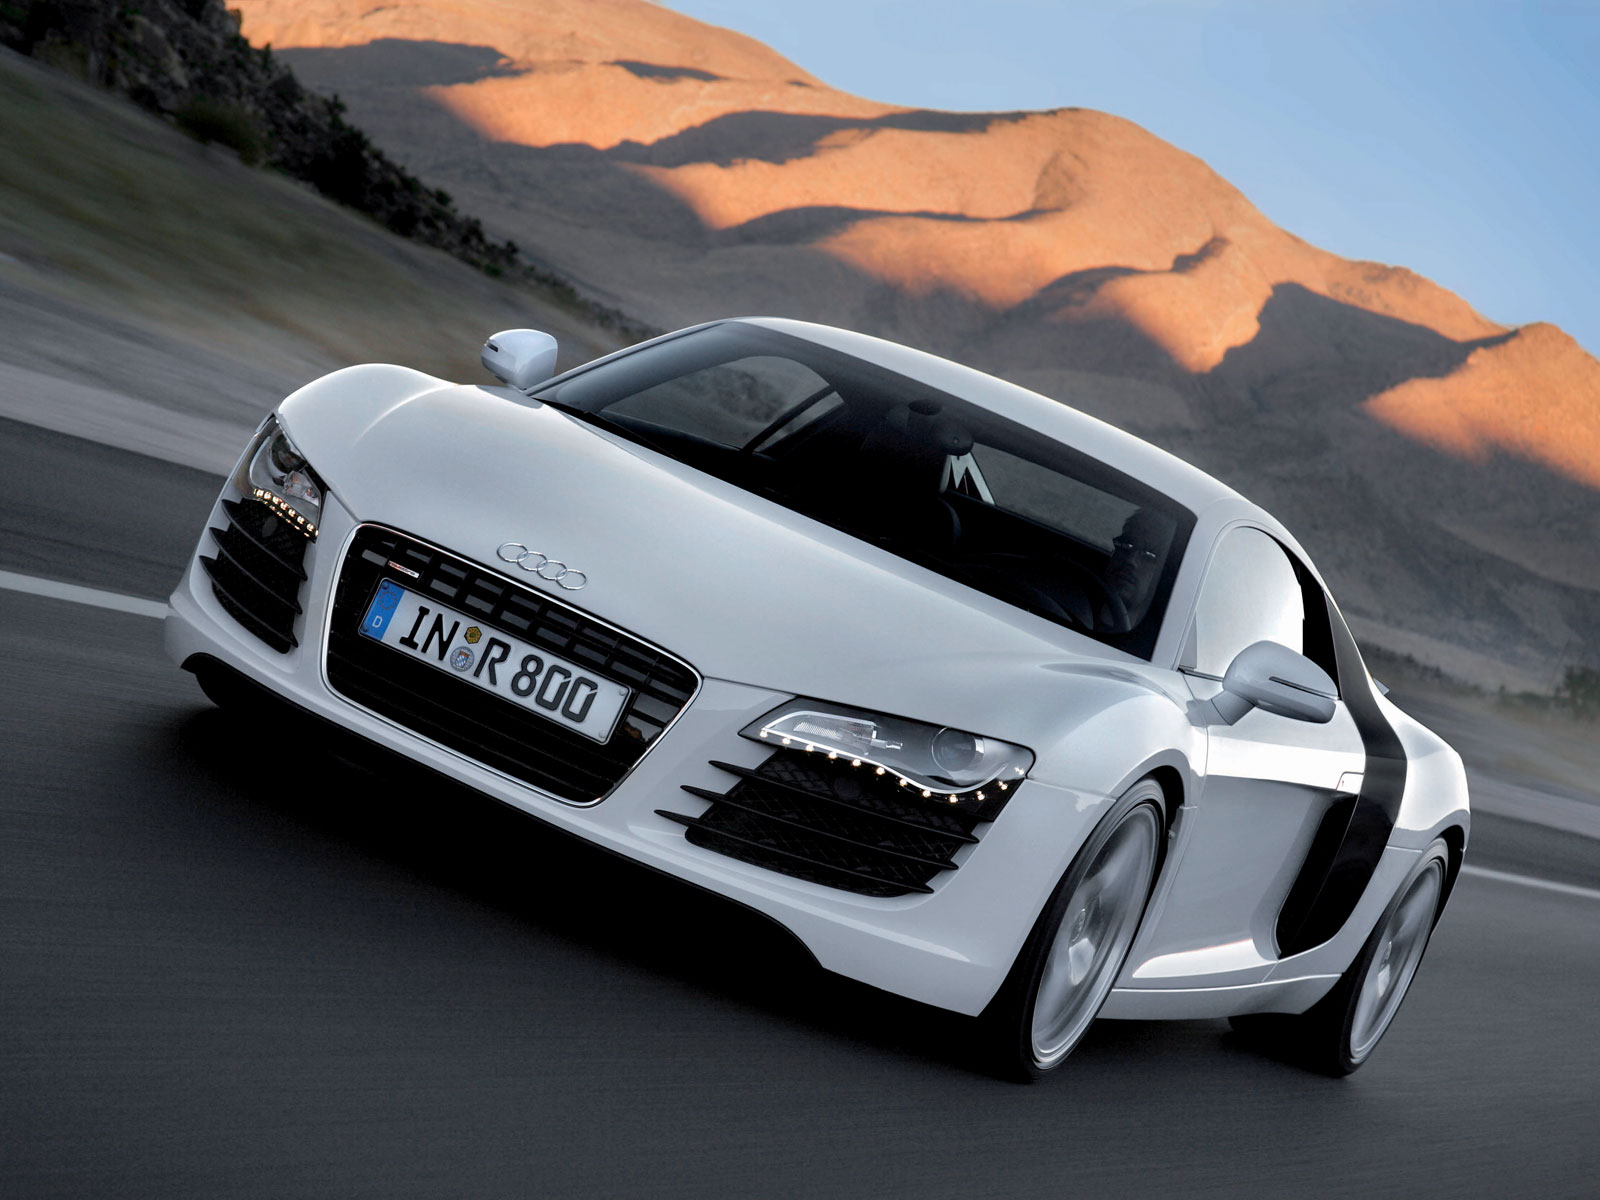 Audi R8 Desktop Backgrounds HD